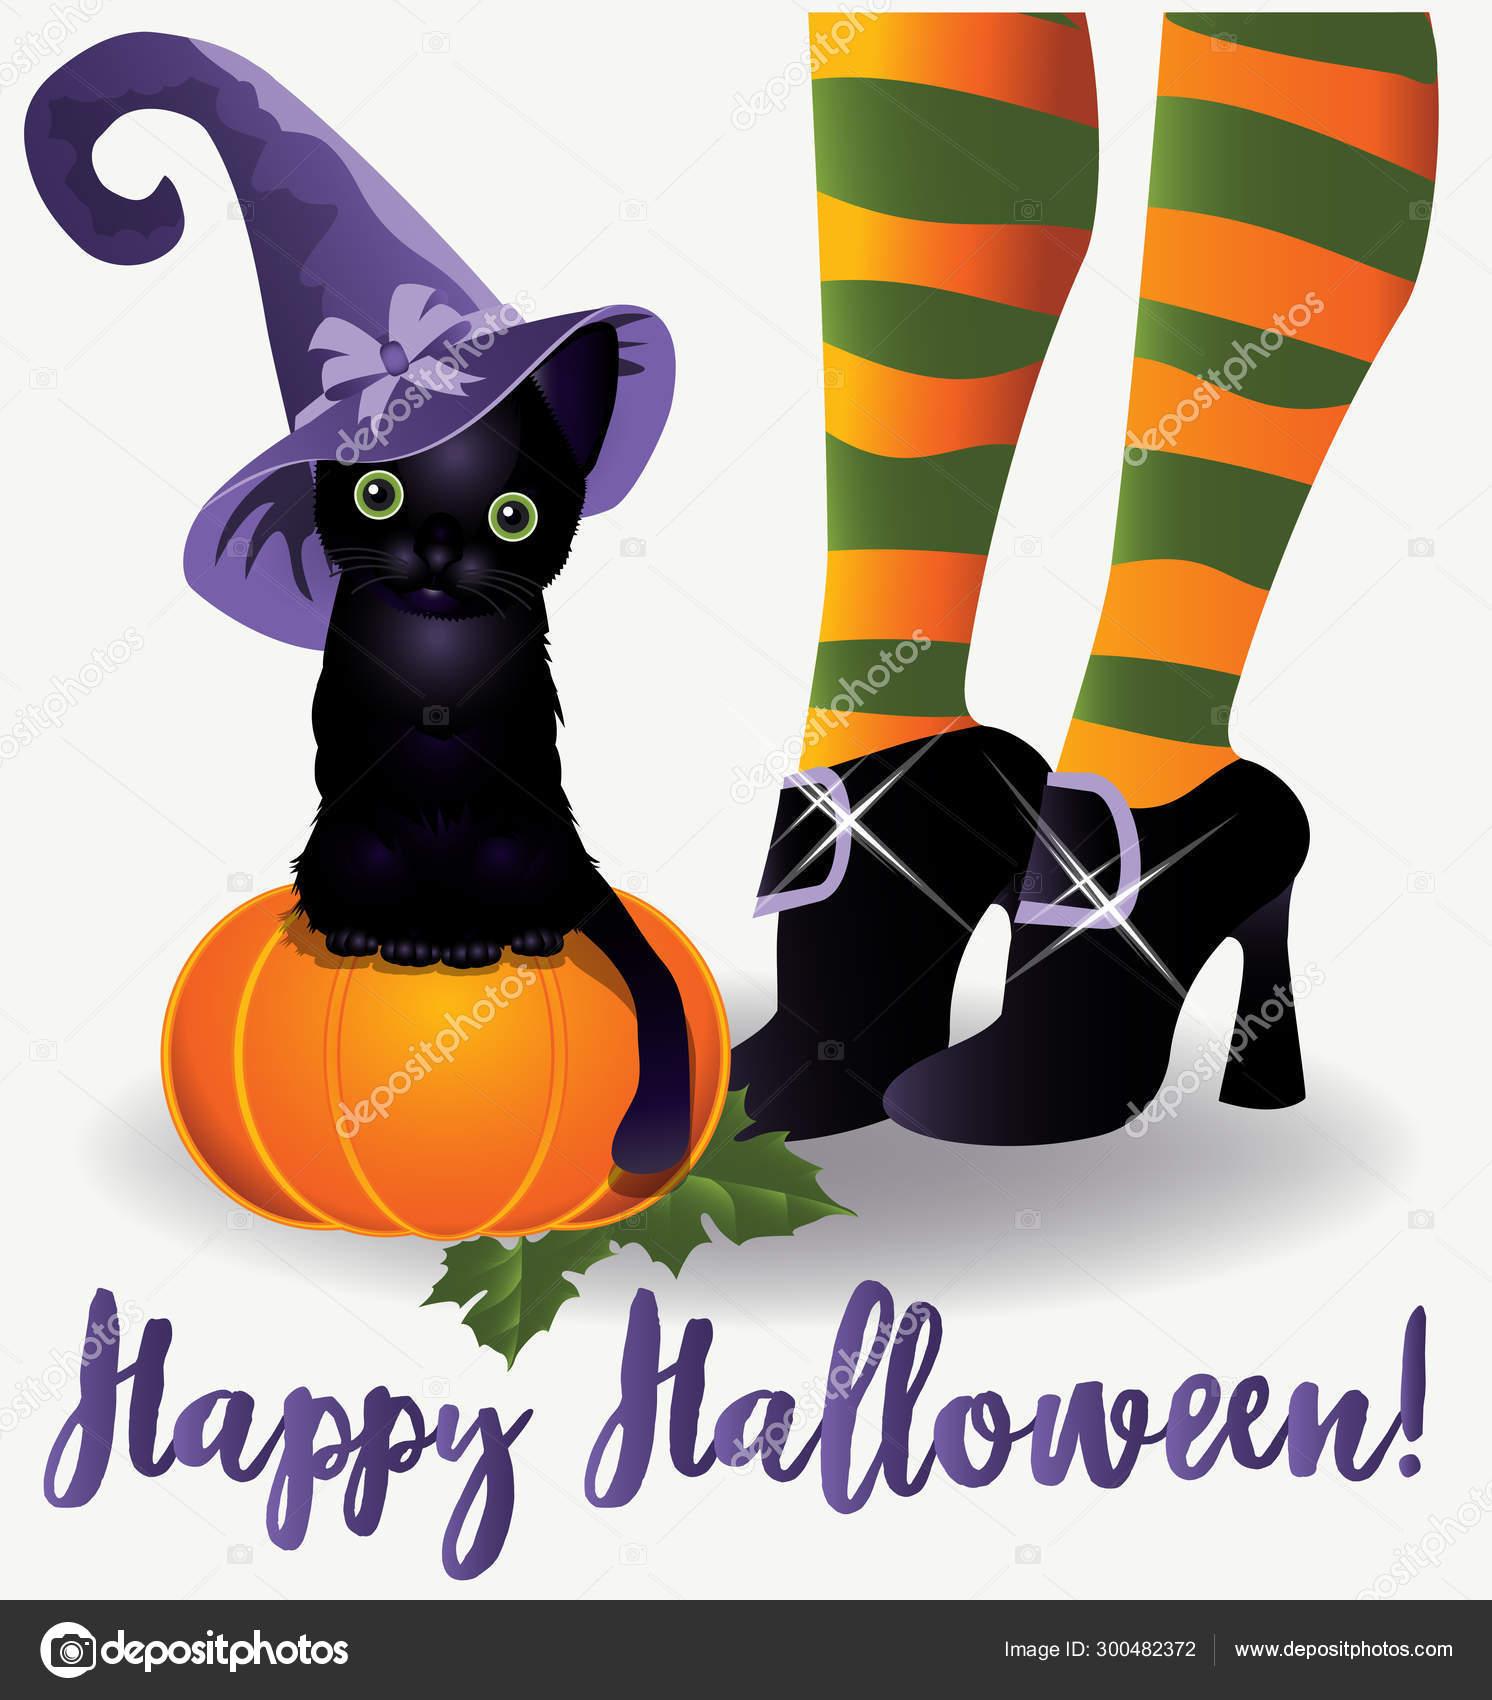 depositphotos 300482372 stock illustration happy halloween wallpaper black cat